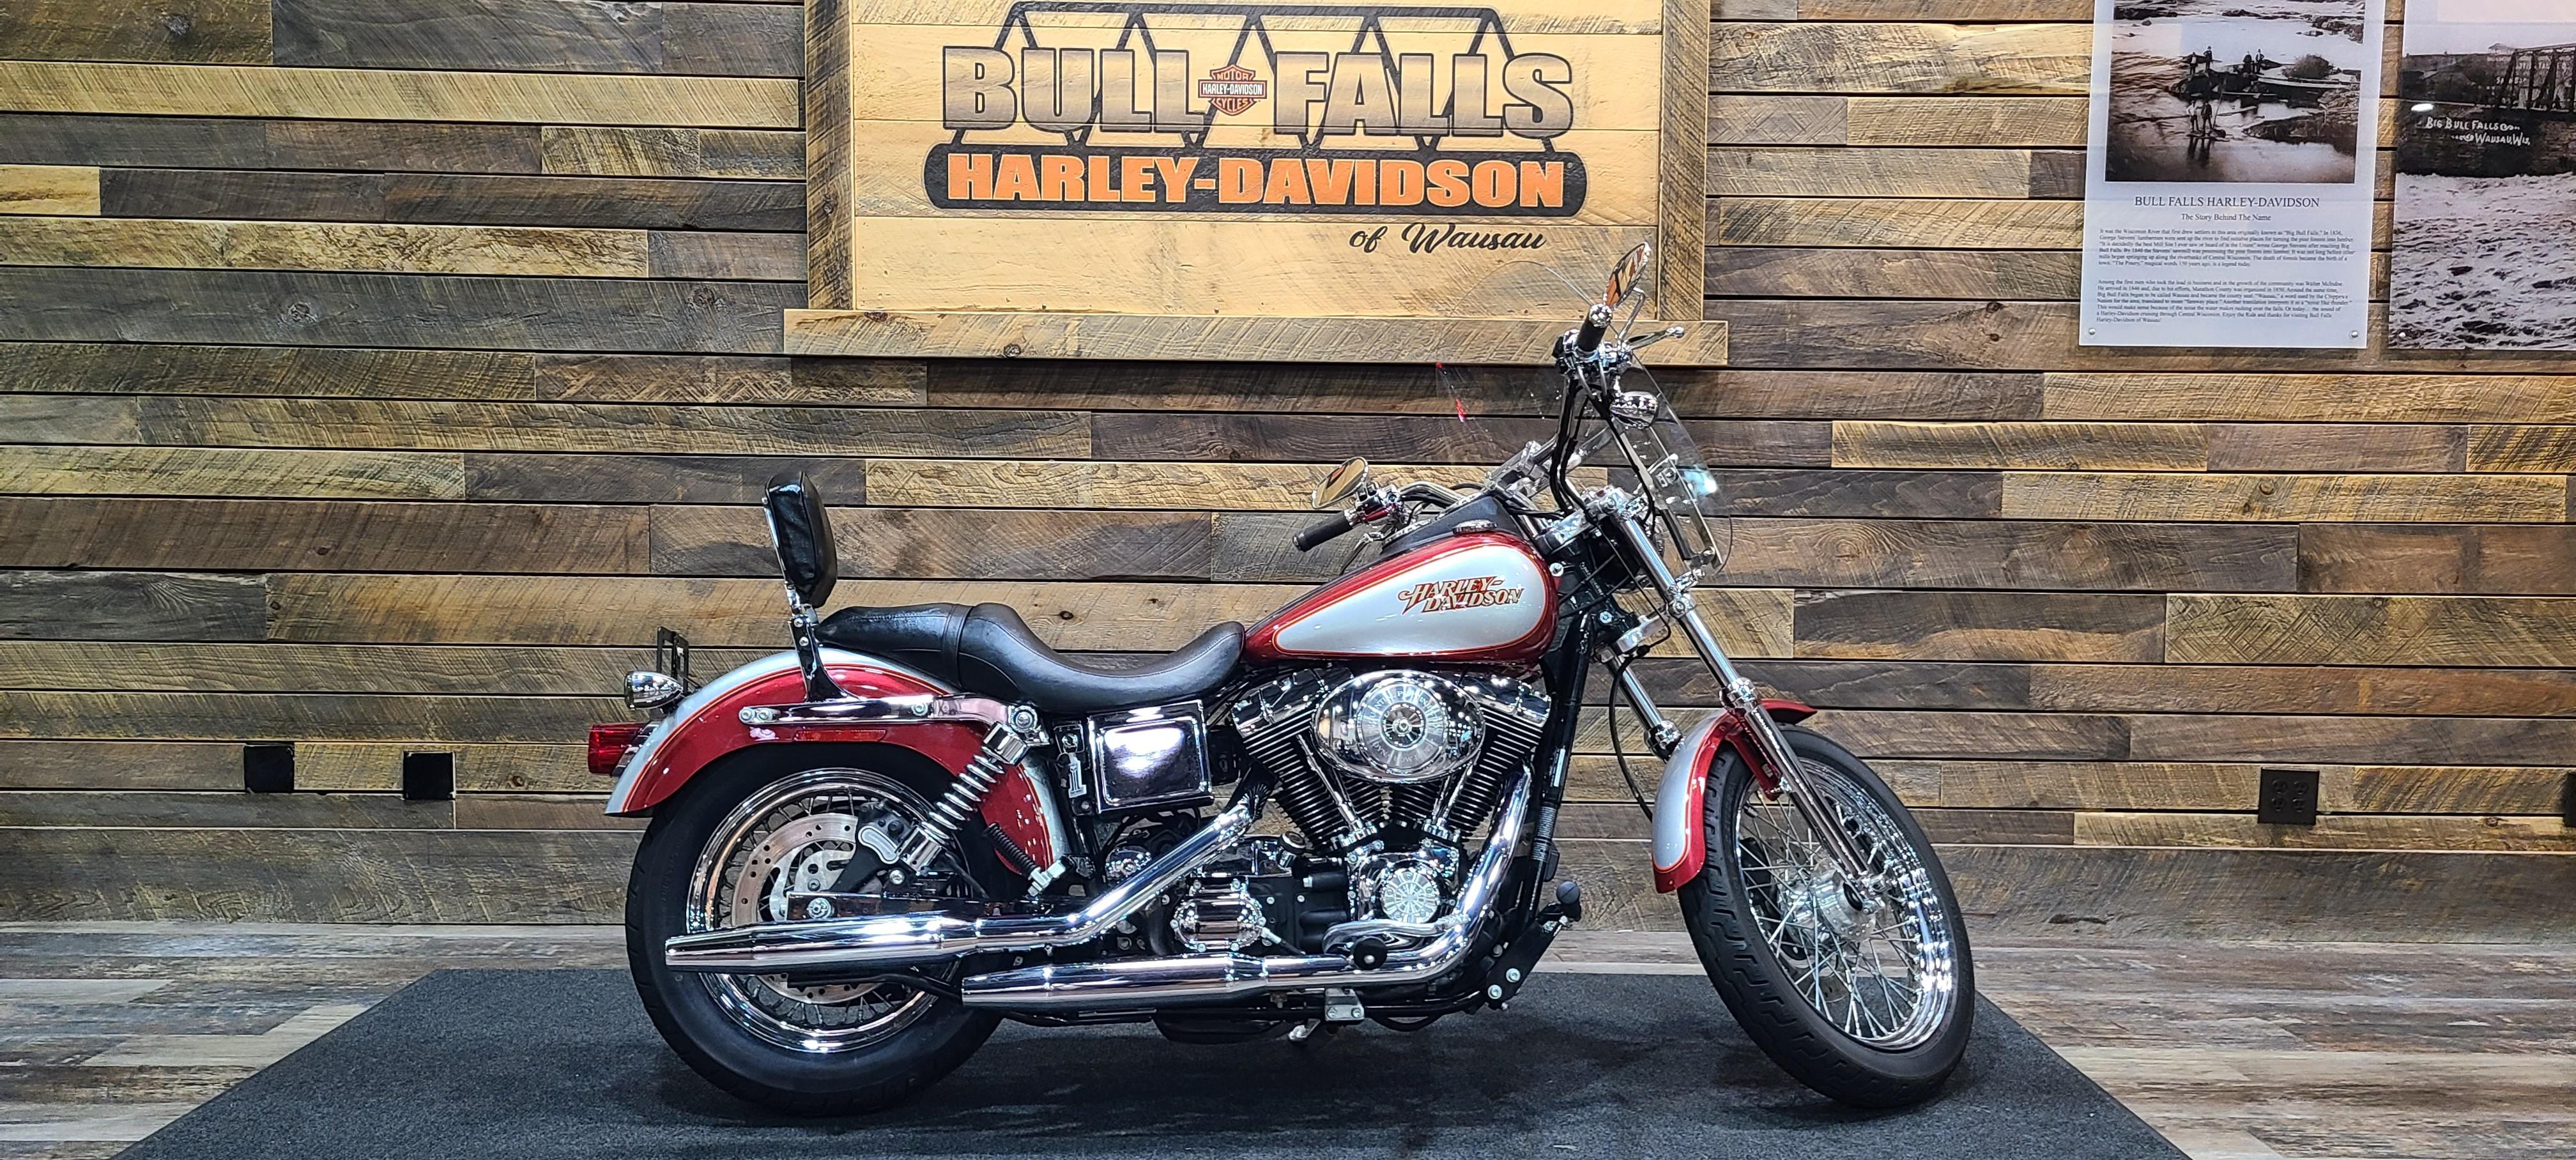 2004 Harley-Davidson Dyna Glide Low Rider at Bull Falls Harley-Davidson